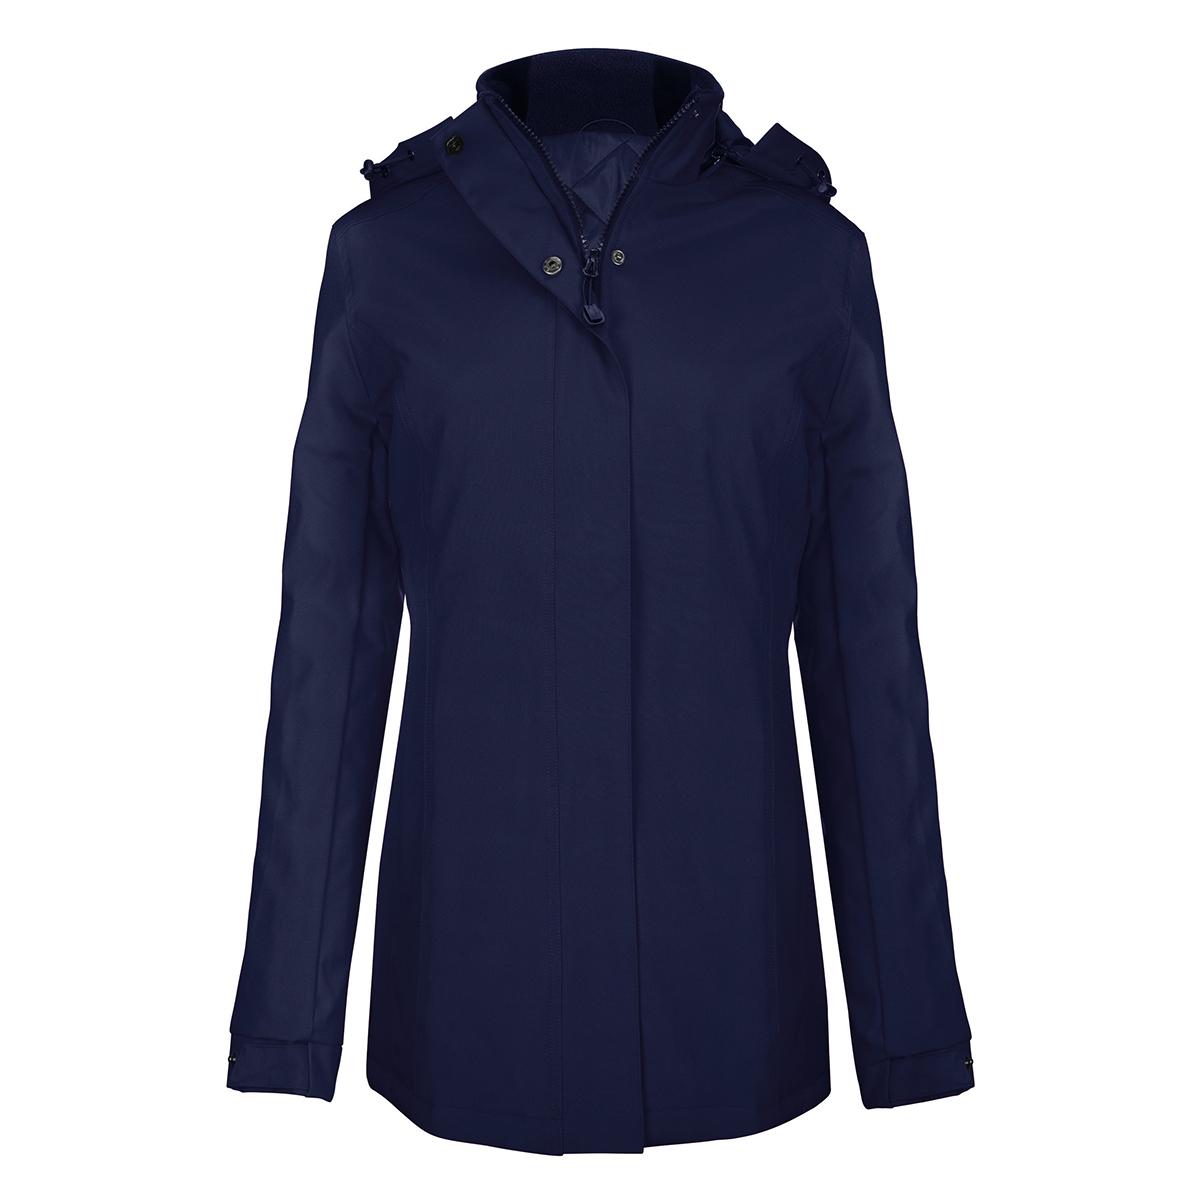 Kariban Womens/Ladies Parka Jacket (XL) (Navy)